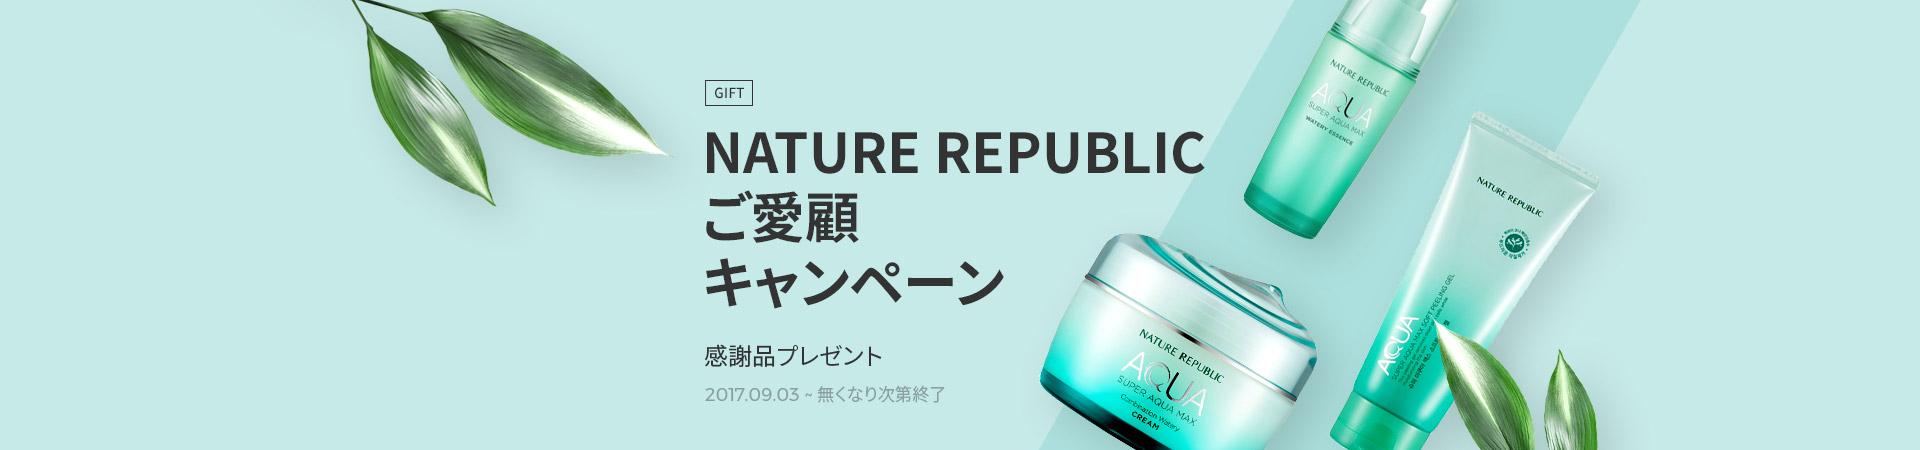 """NATURE REPUBLIC ご愛顧感謝キャンペーン"""